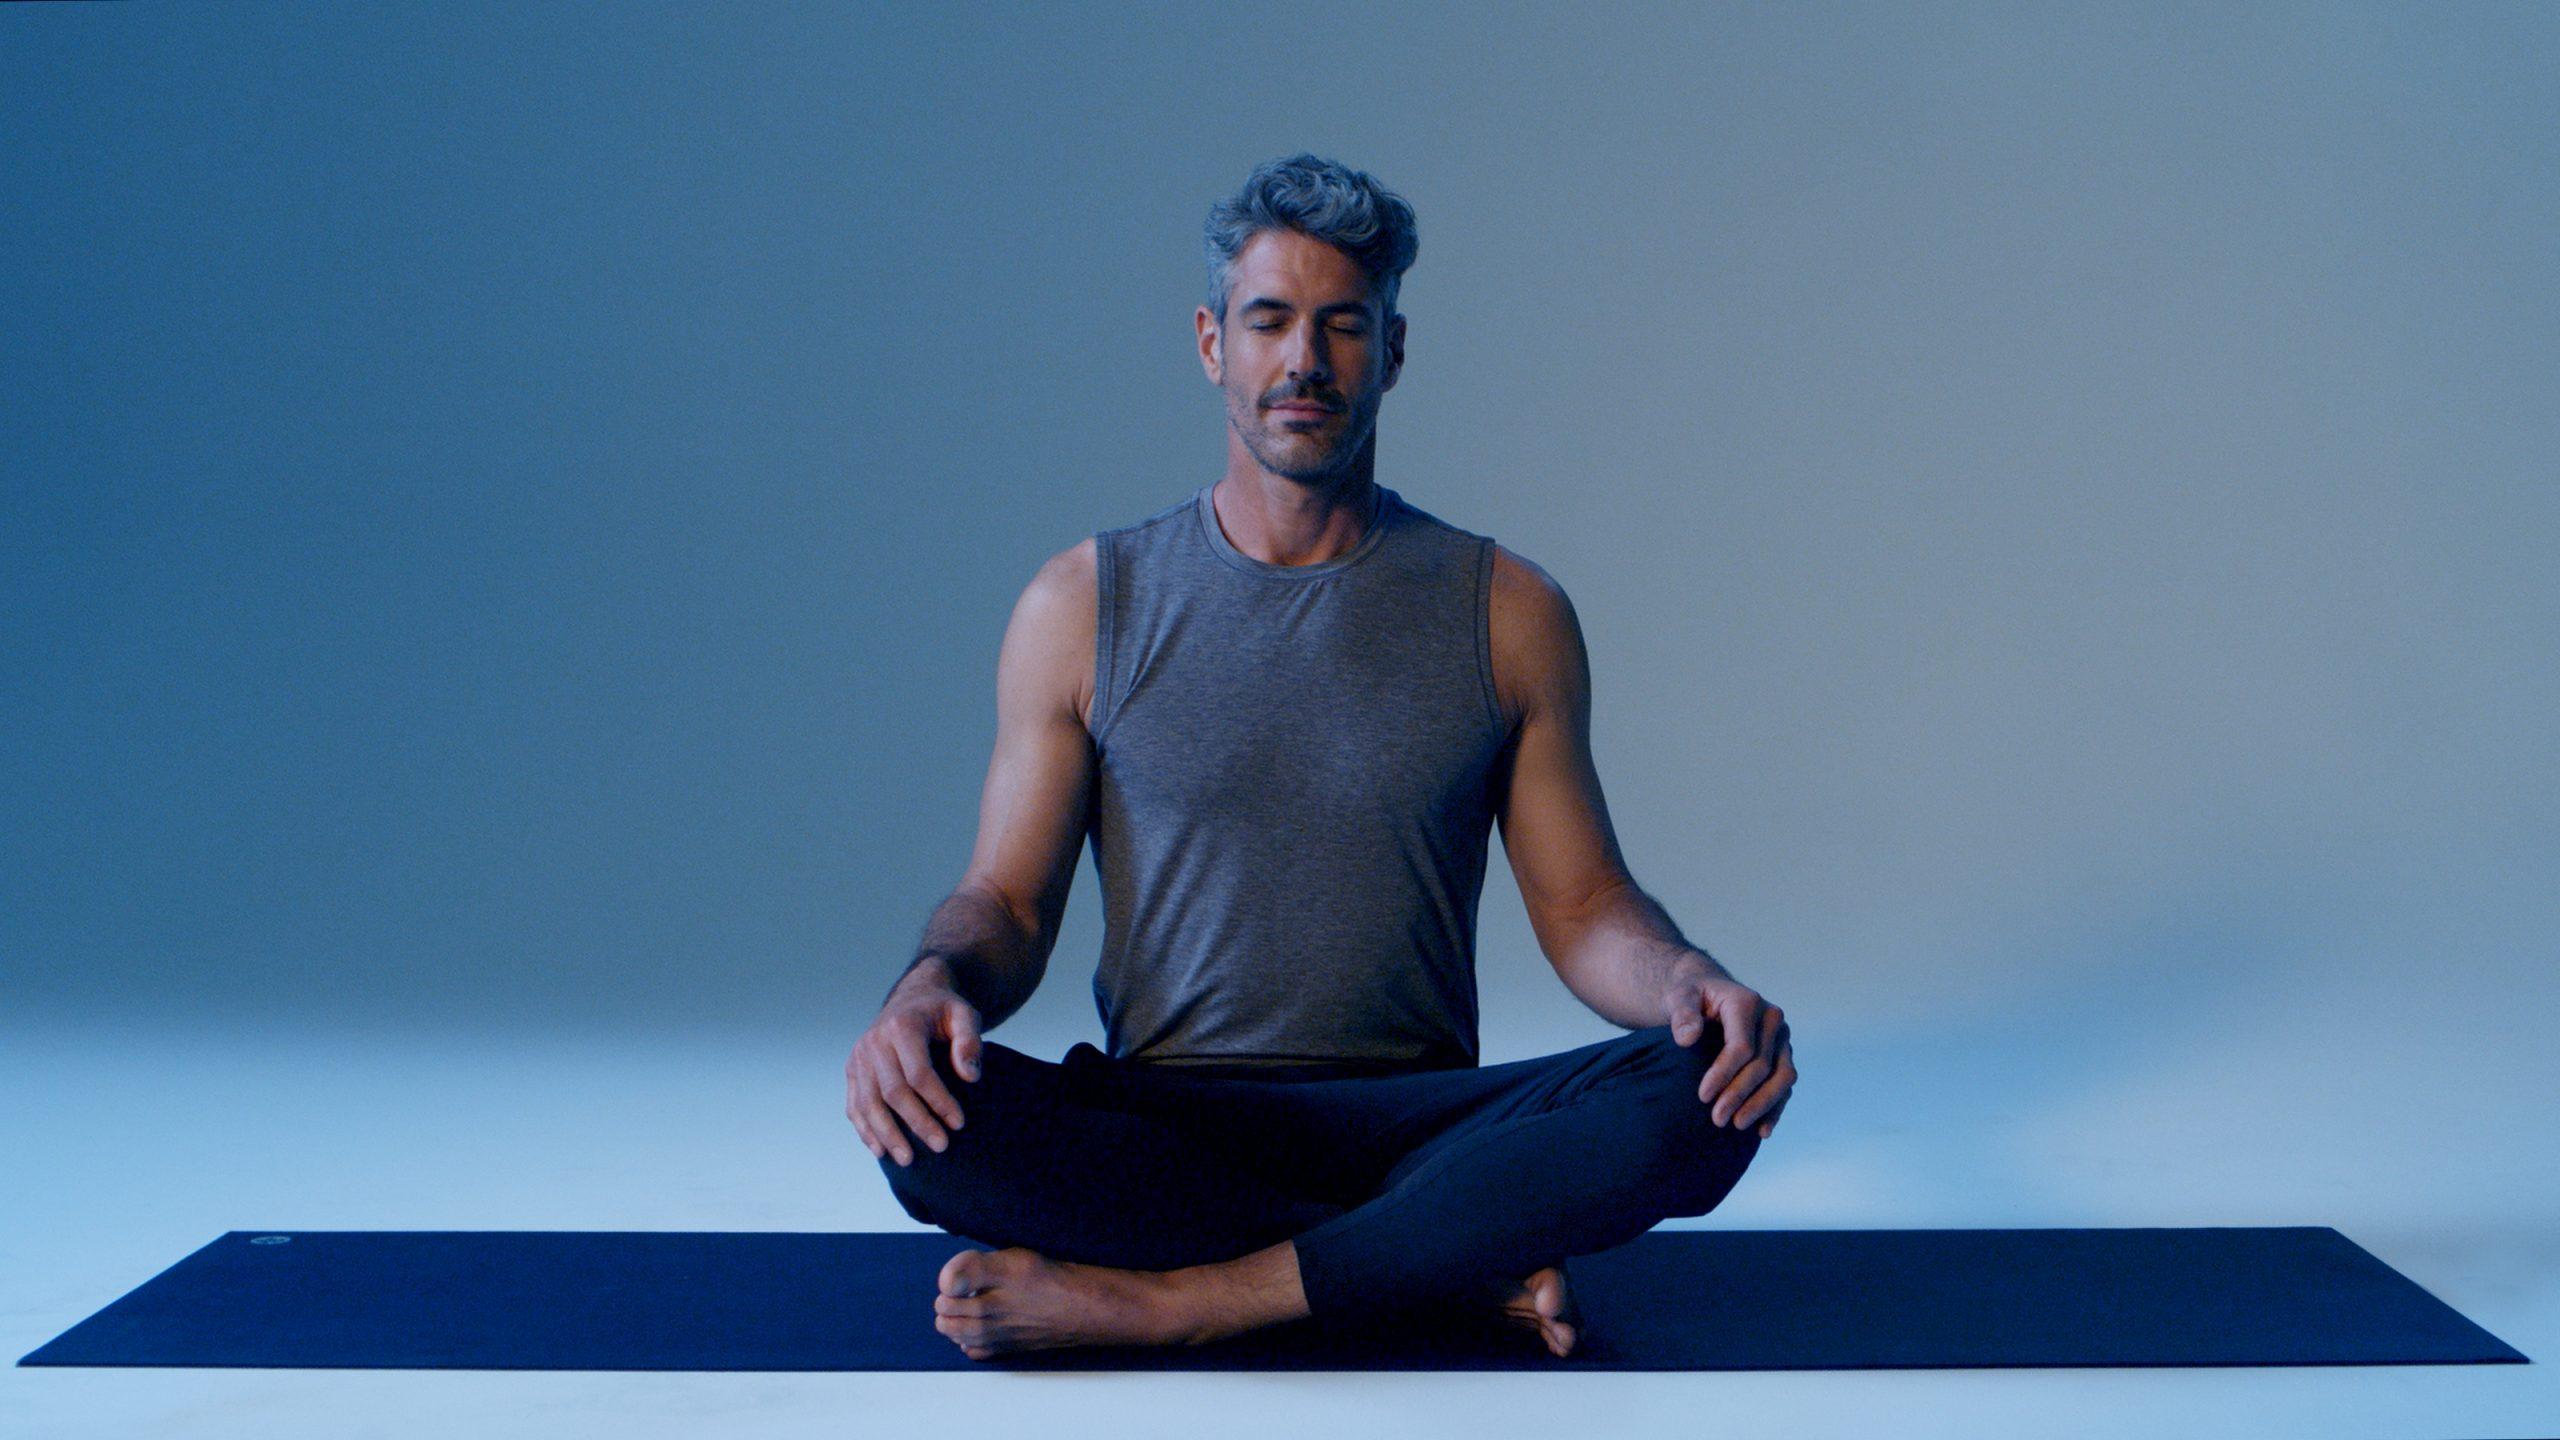 man in seated yoga pose meditating